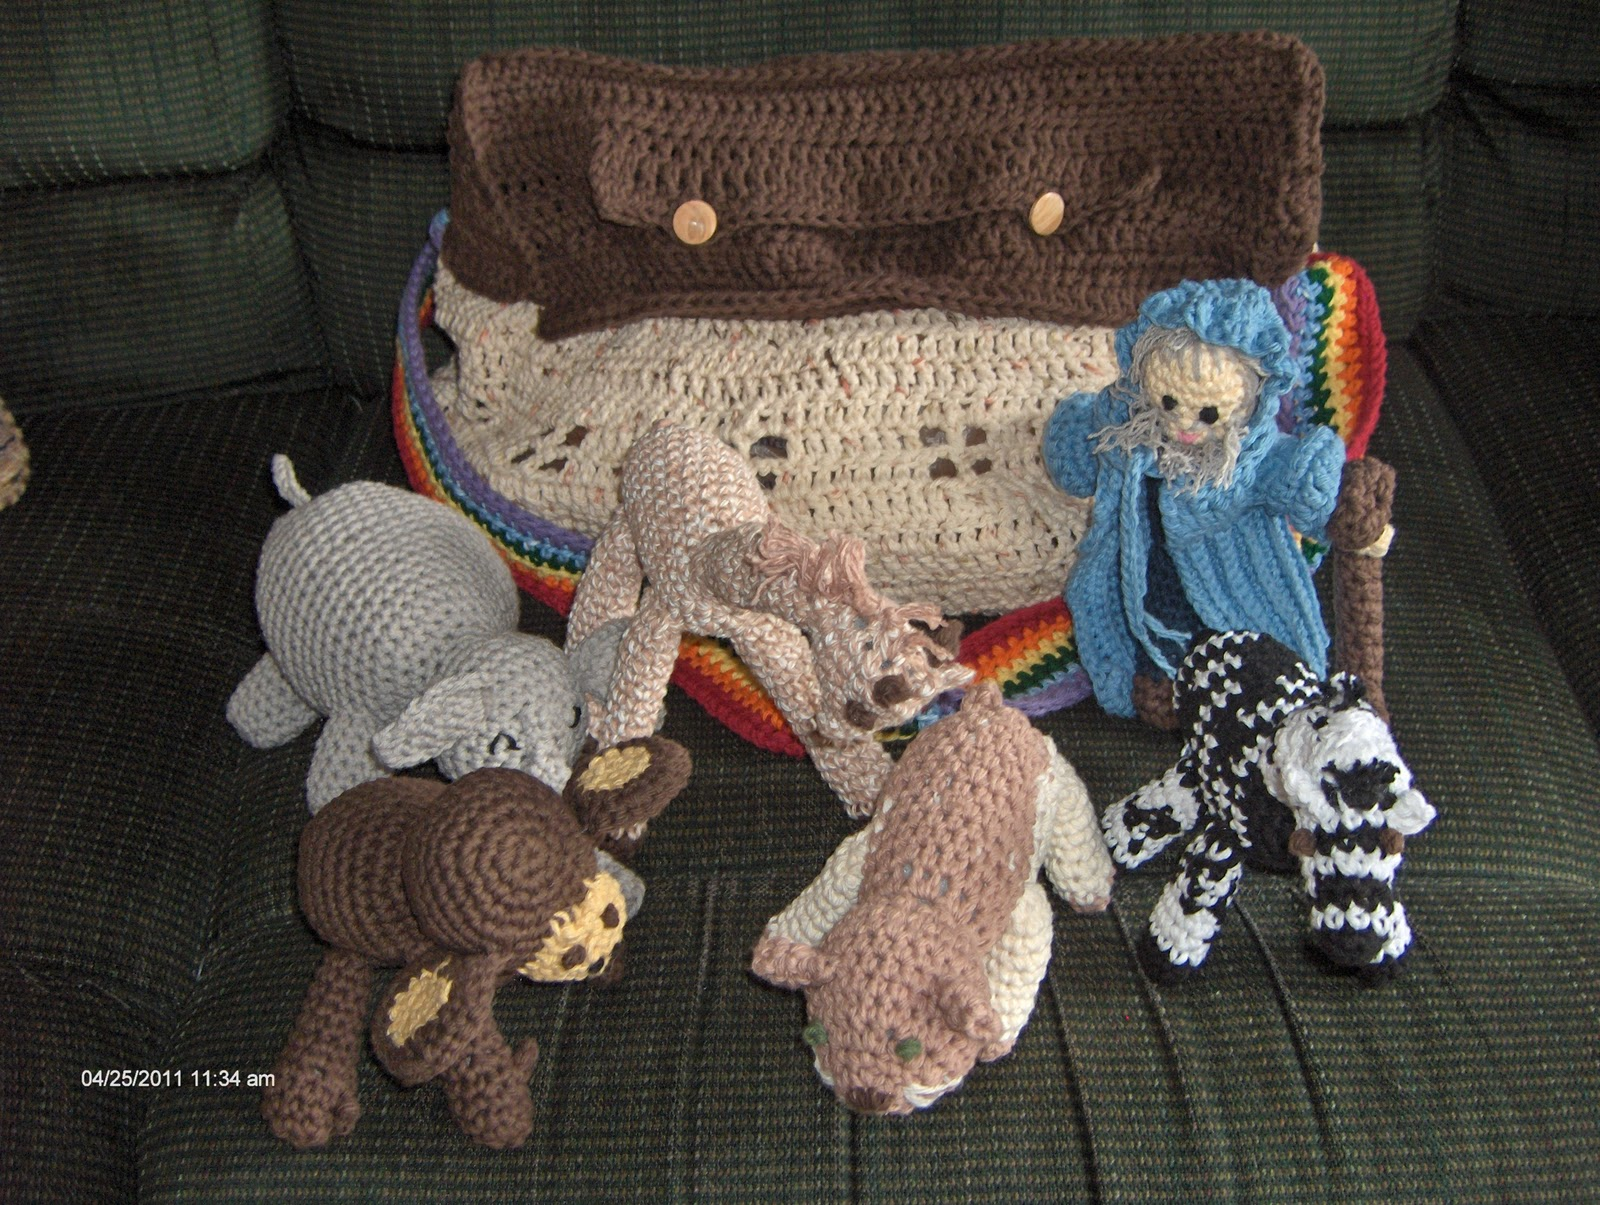 Mary Ann's Crochet : Noah's Ark Bag